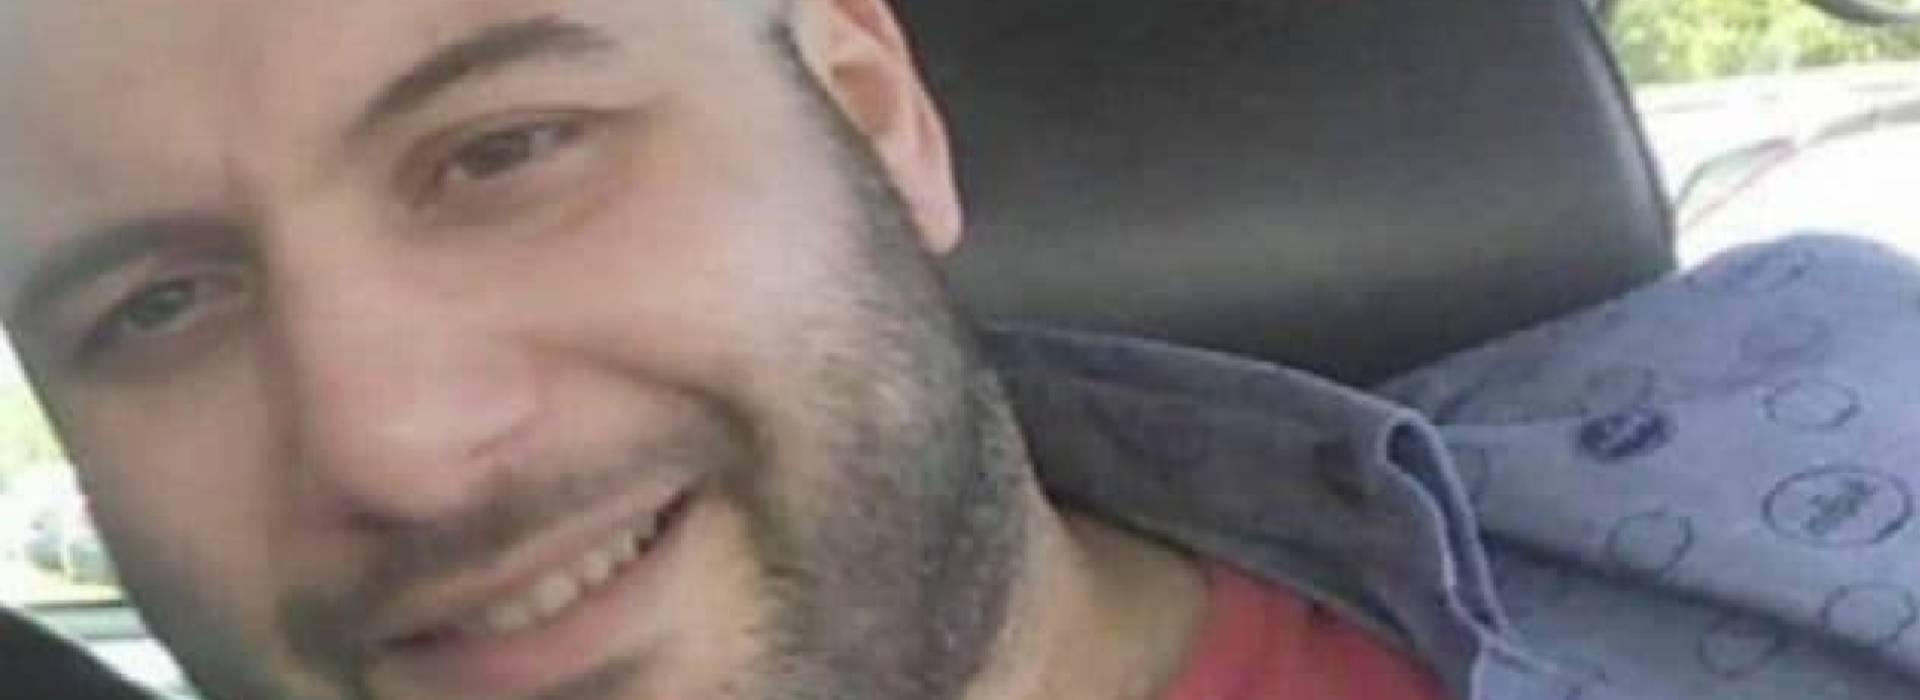 Emanuele Renzi era sanissimo: ed è morto di coronavirus